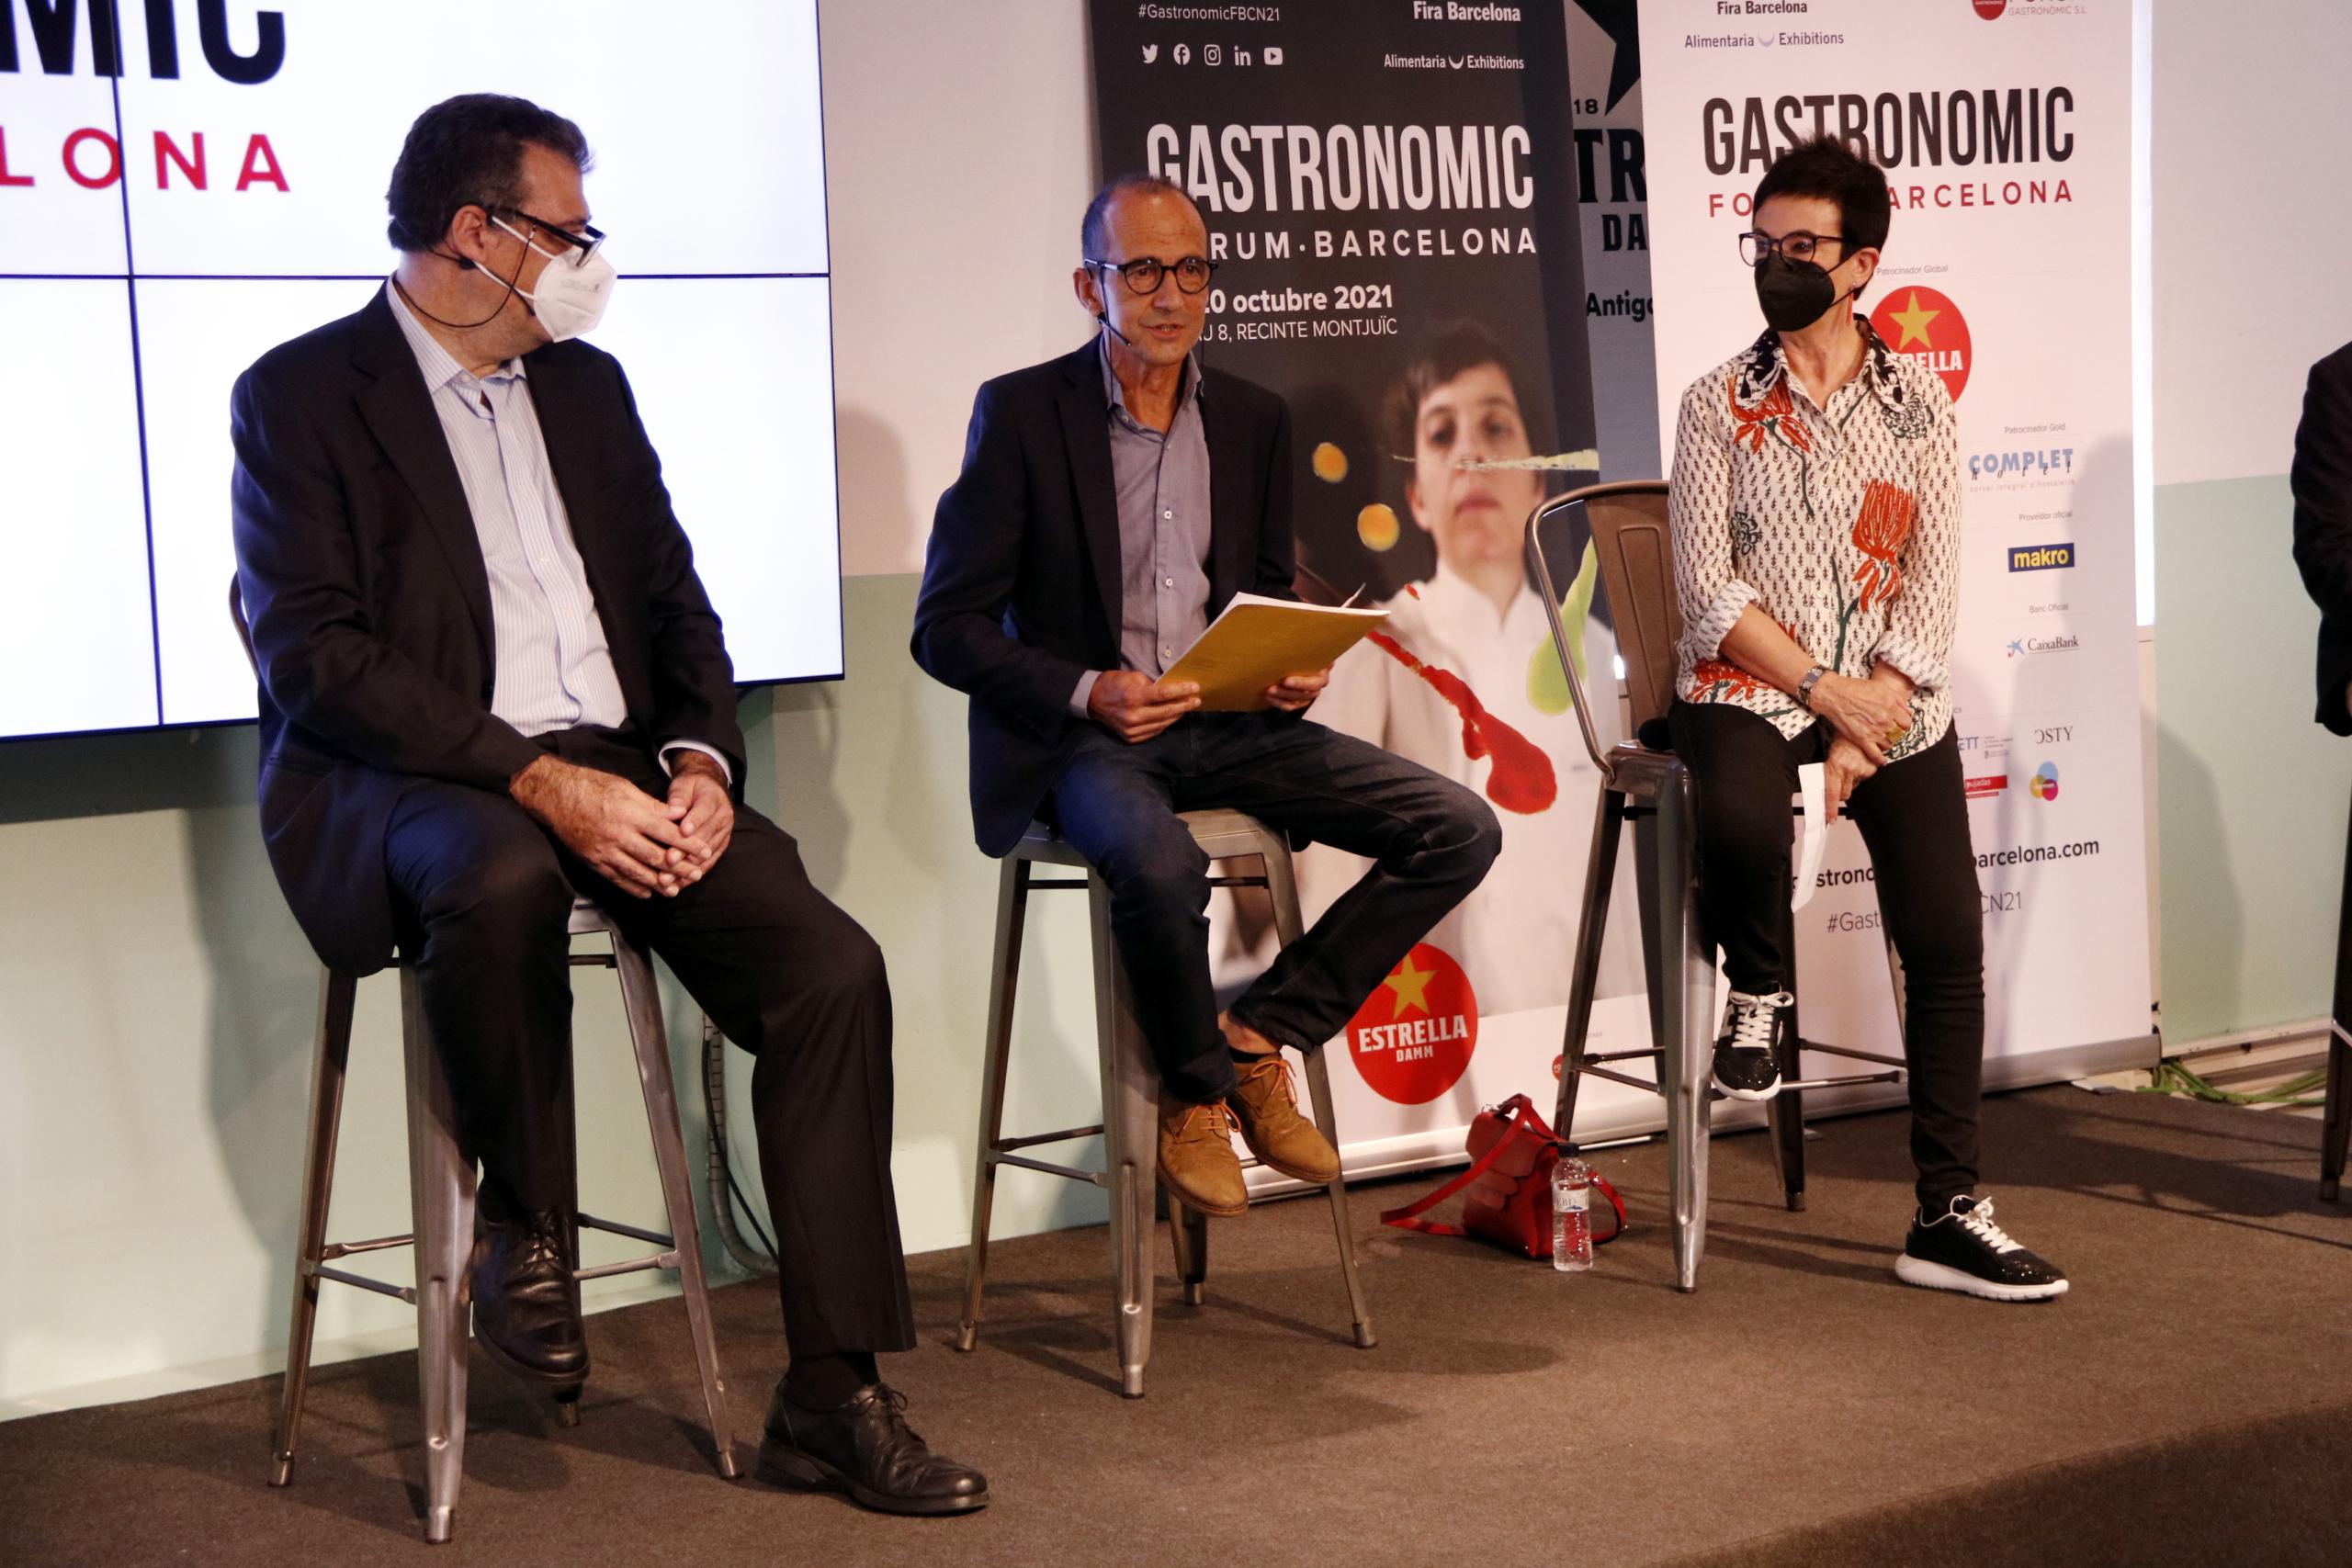 Josep Alcaraz, Pep Palau i Carme Ruscalleda en la presentació del Gastronomic Forum Barcelona | ACN